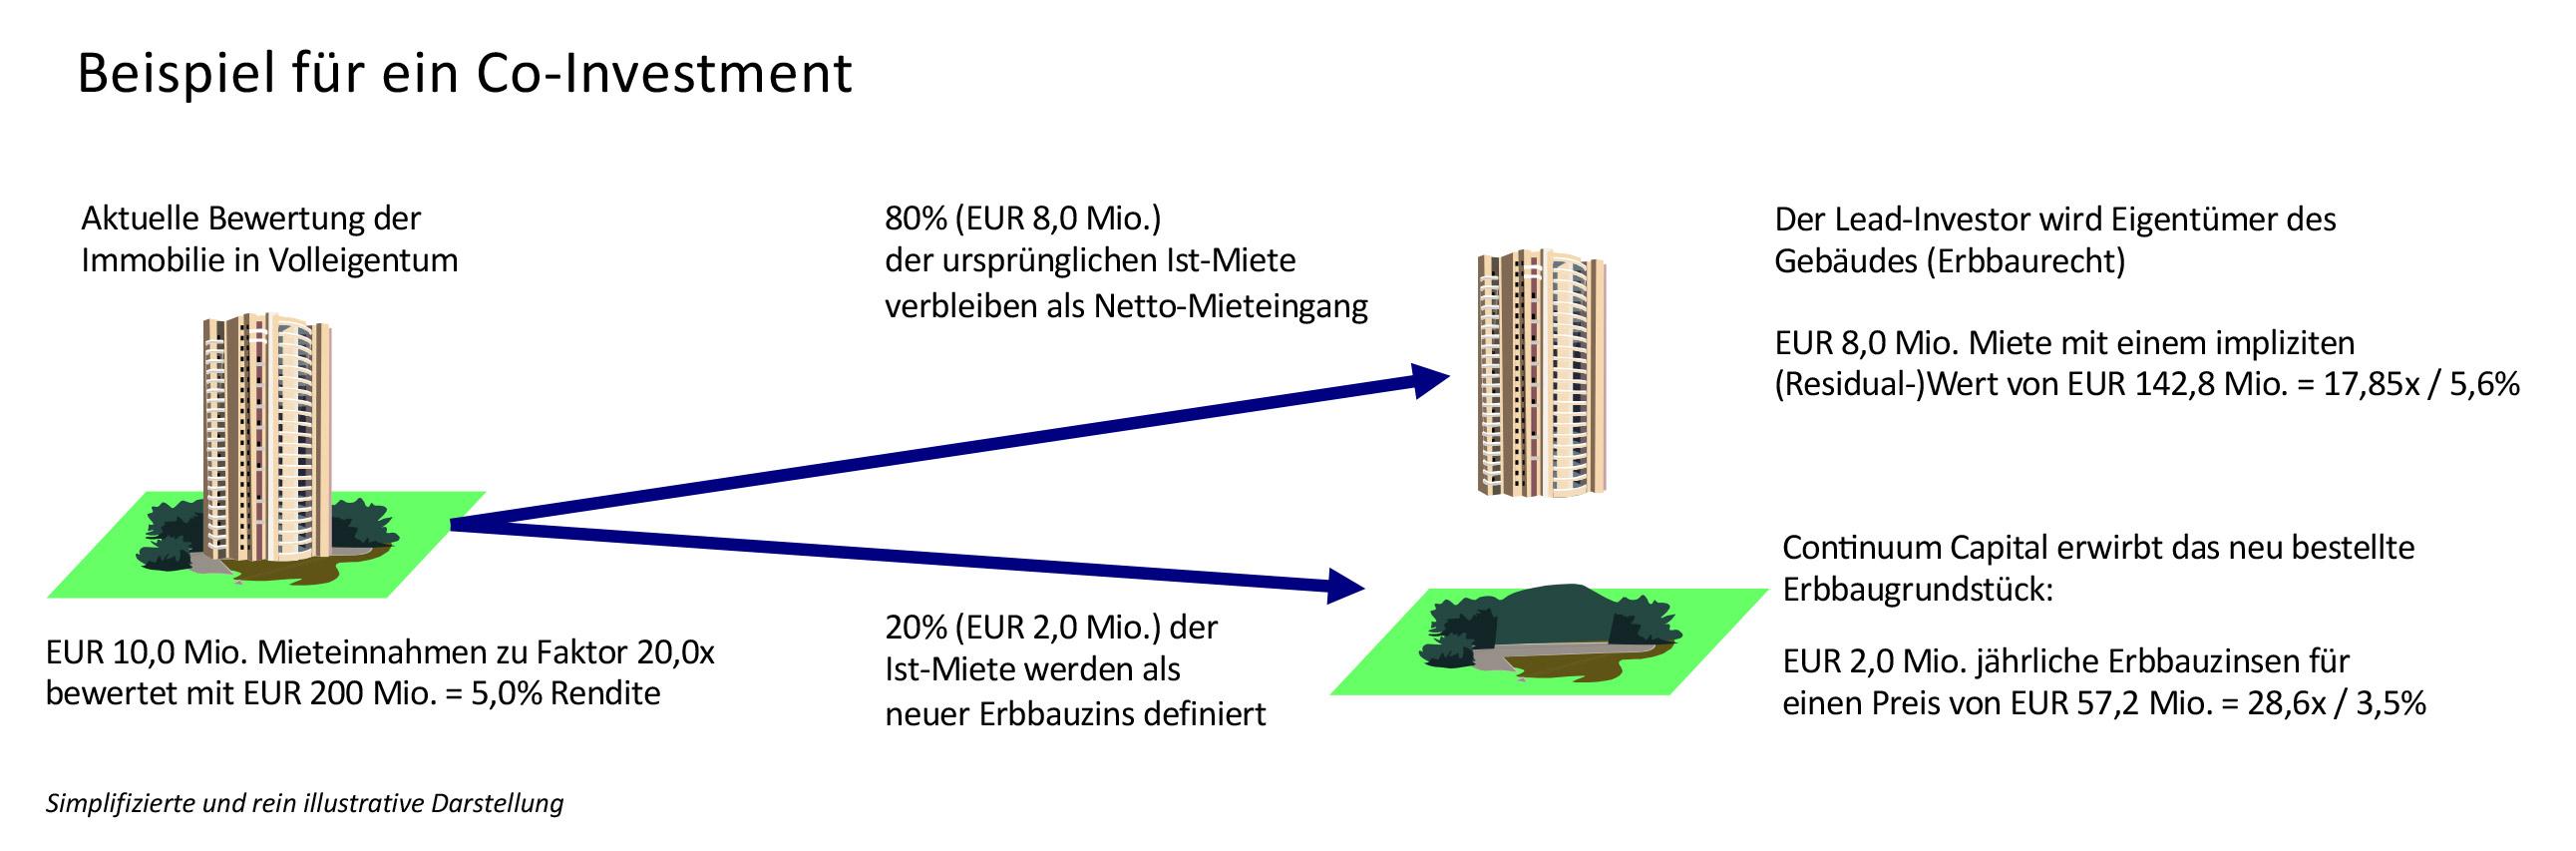 Extrem Co-Investment – Continuum Capital Investment Management GmbH PH14